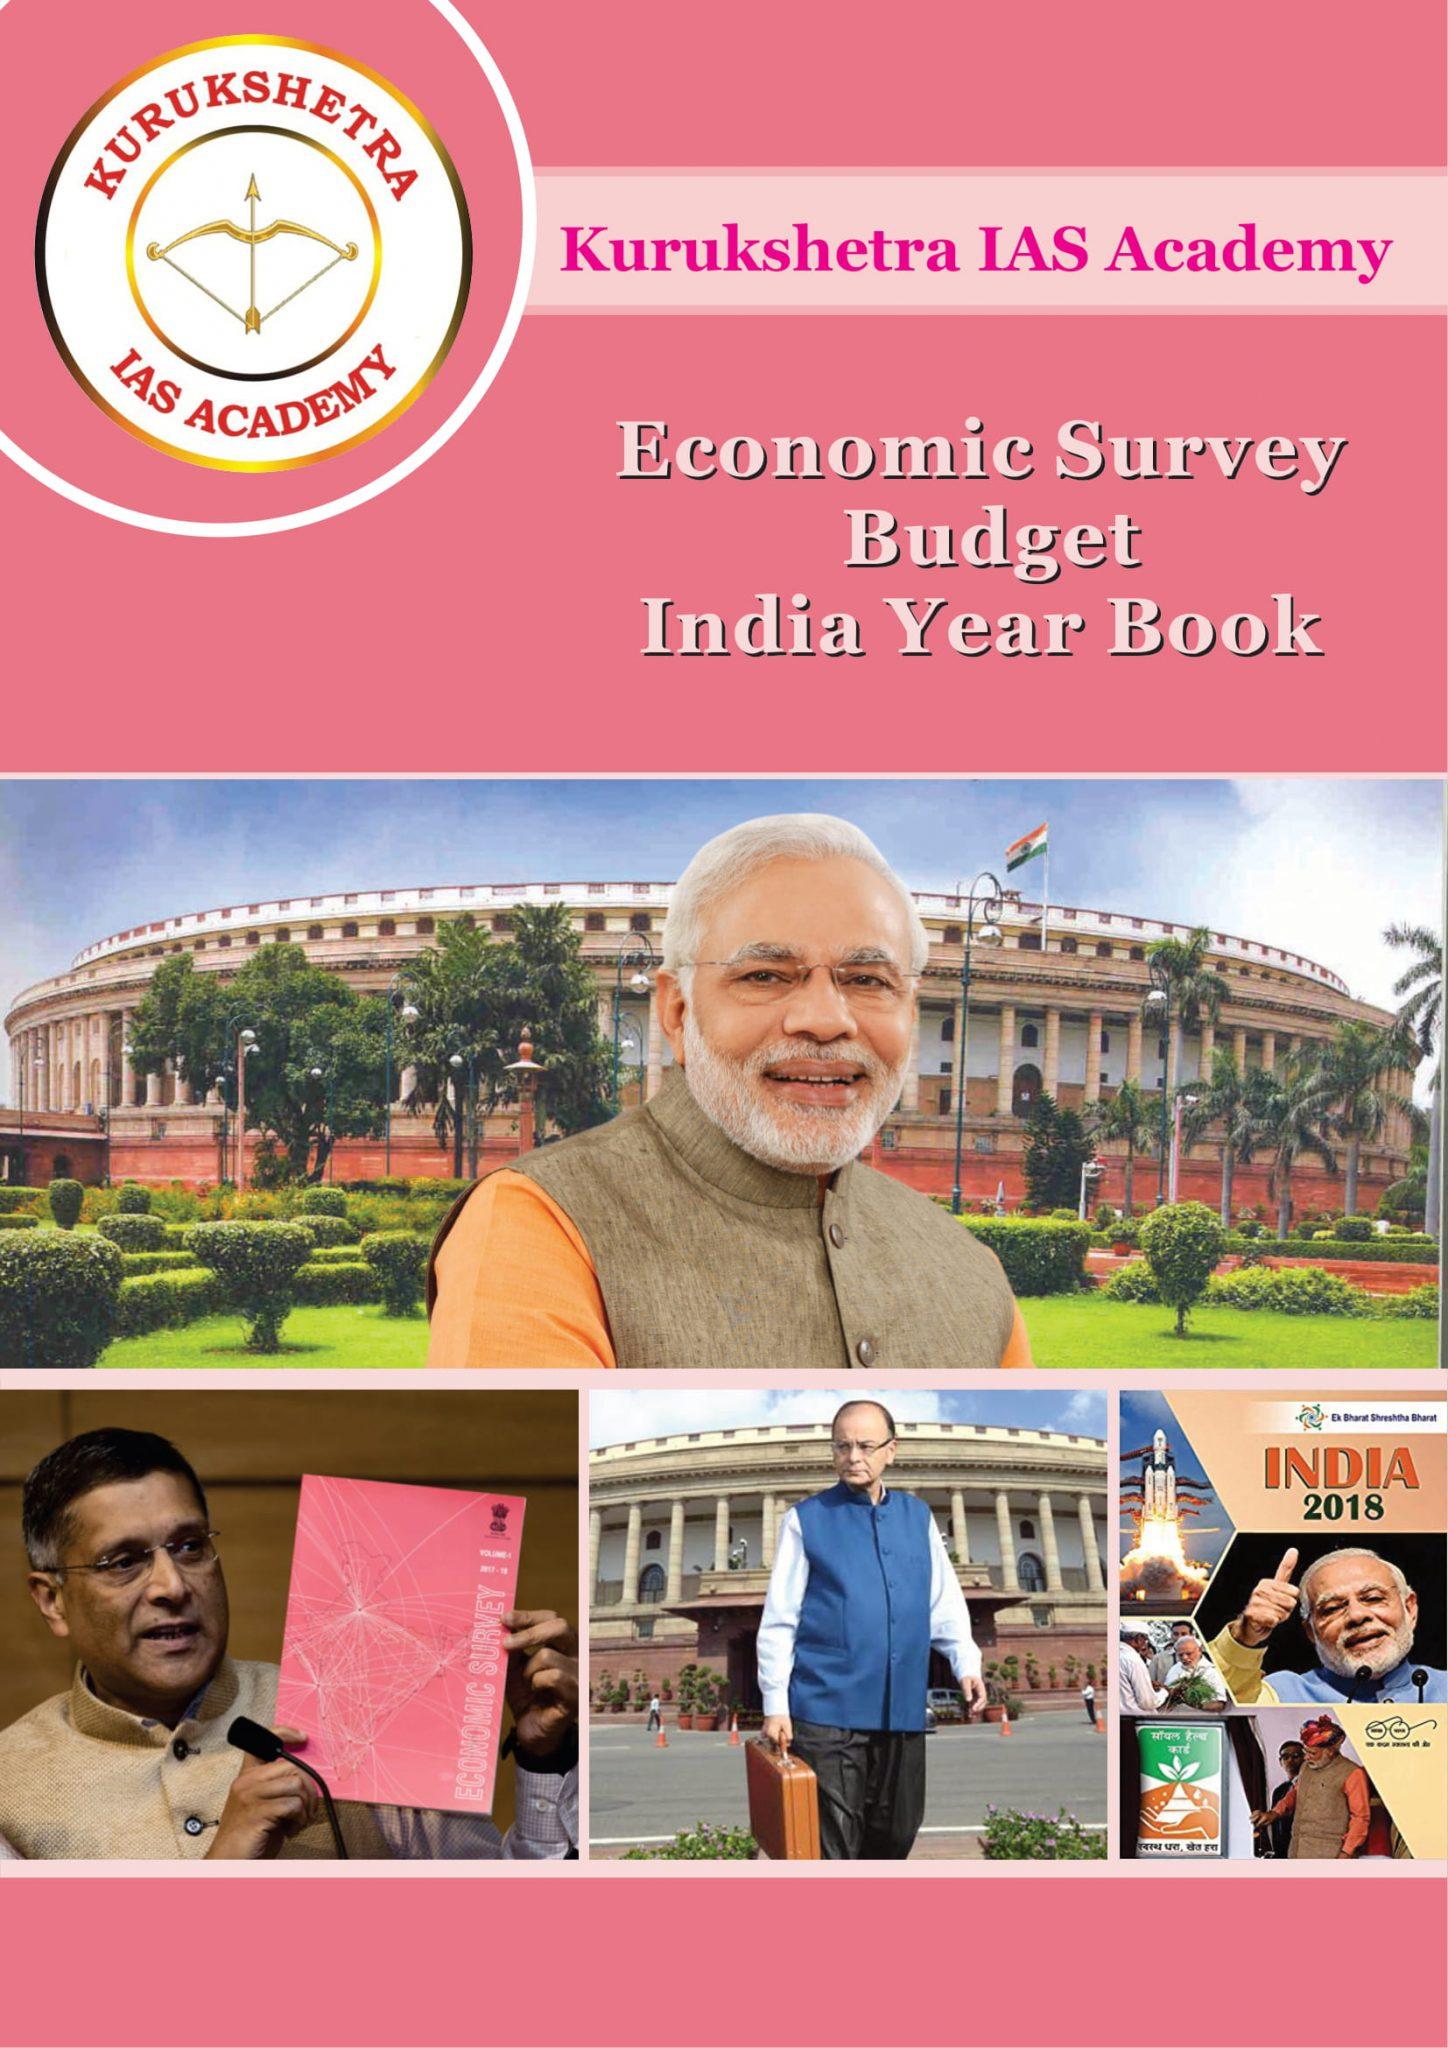 economic survey budget india year book